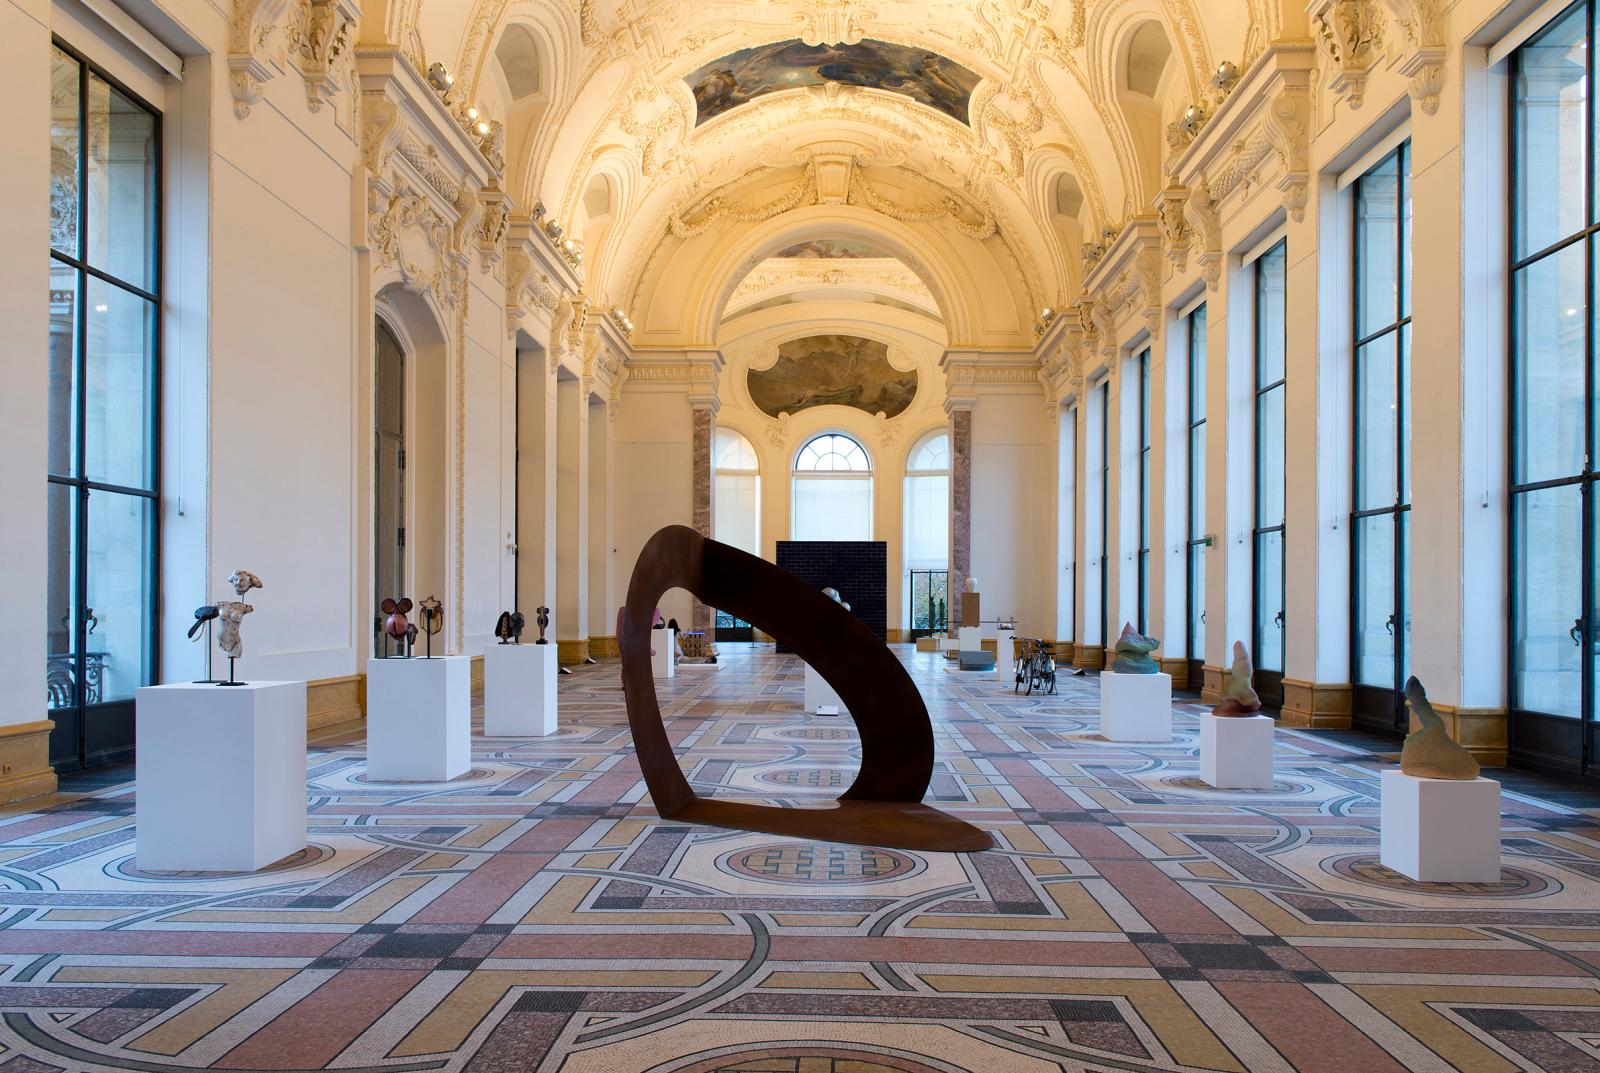 Felice Varini (b. 1952), «Ellipse Sans Titre», 2018, Semiose. FIAC 2018, Petit Palais.